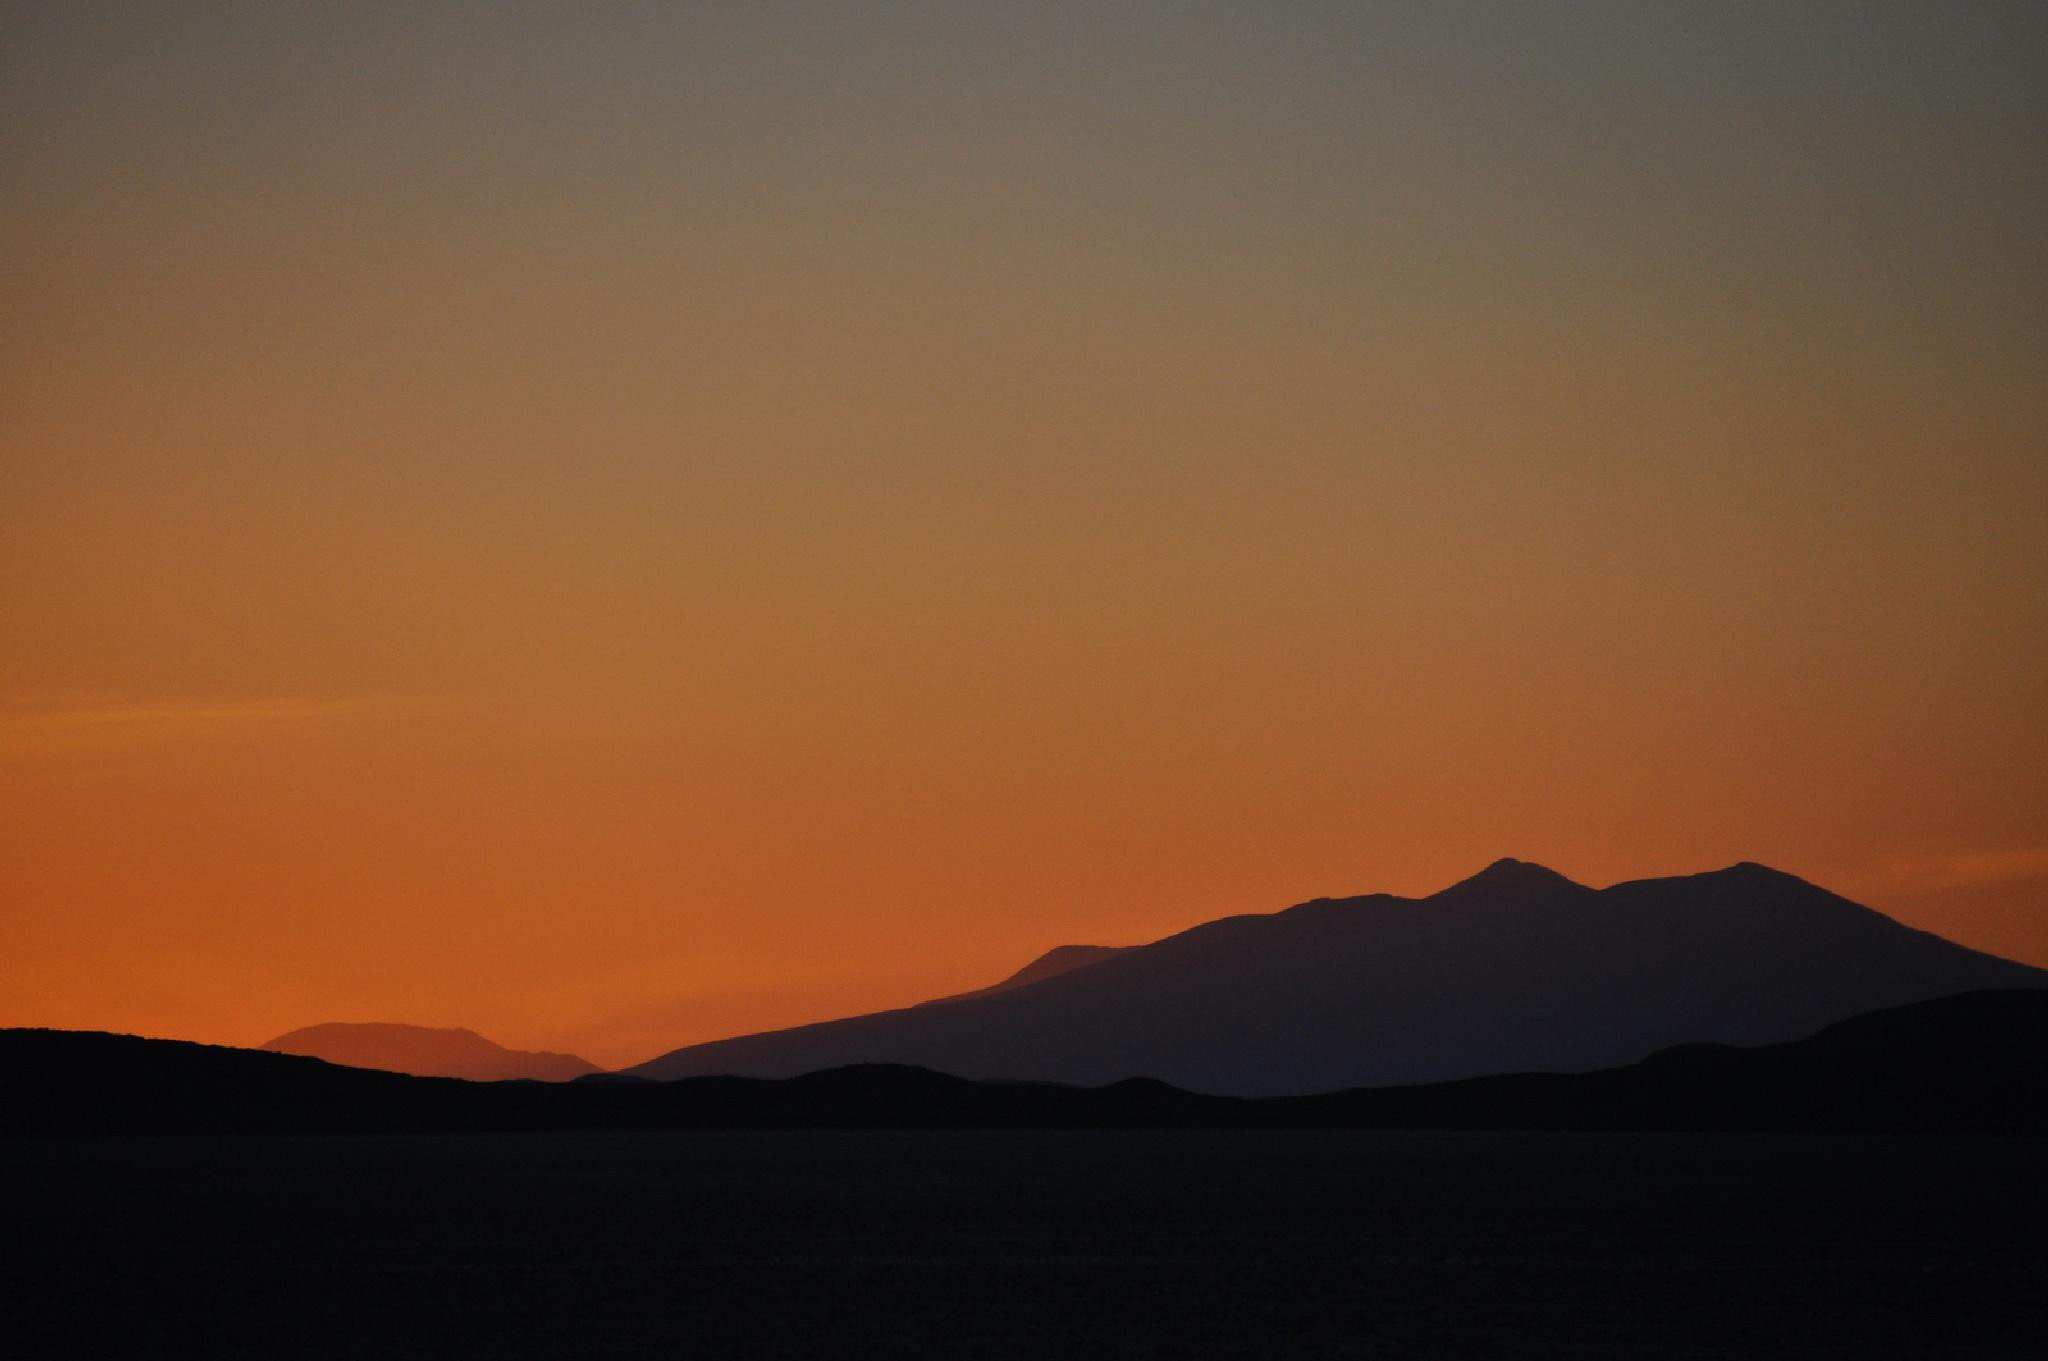 Sunset on salt by MonikaH